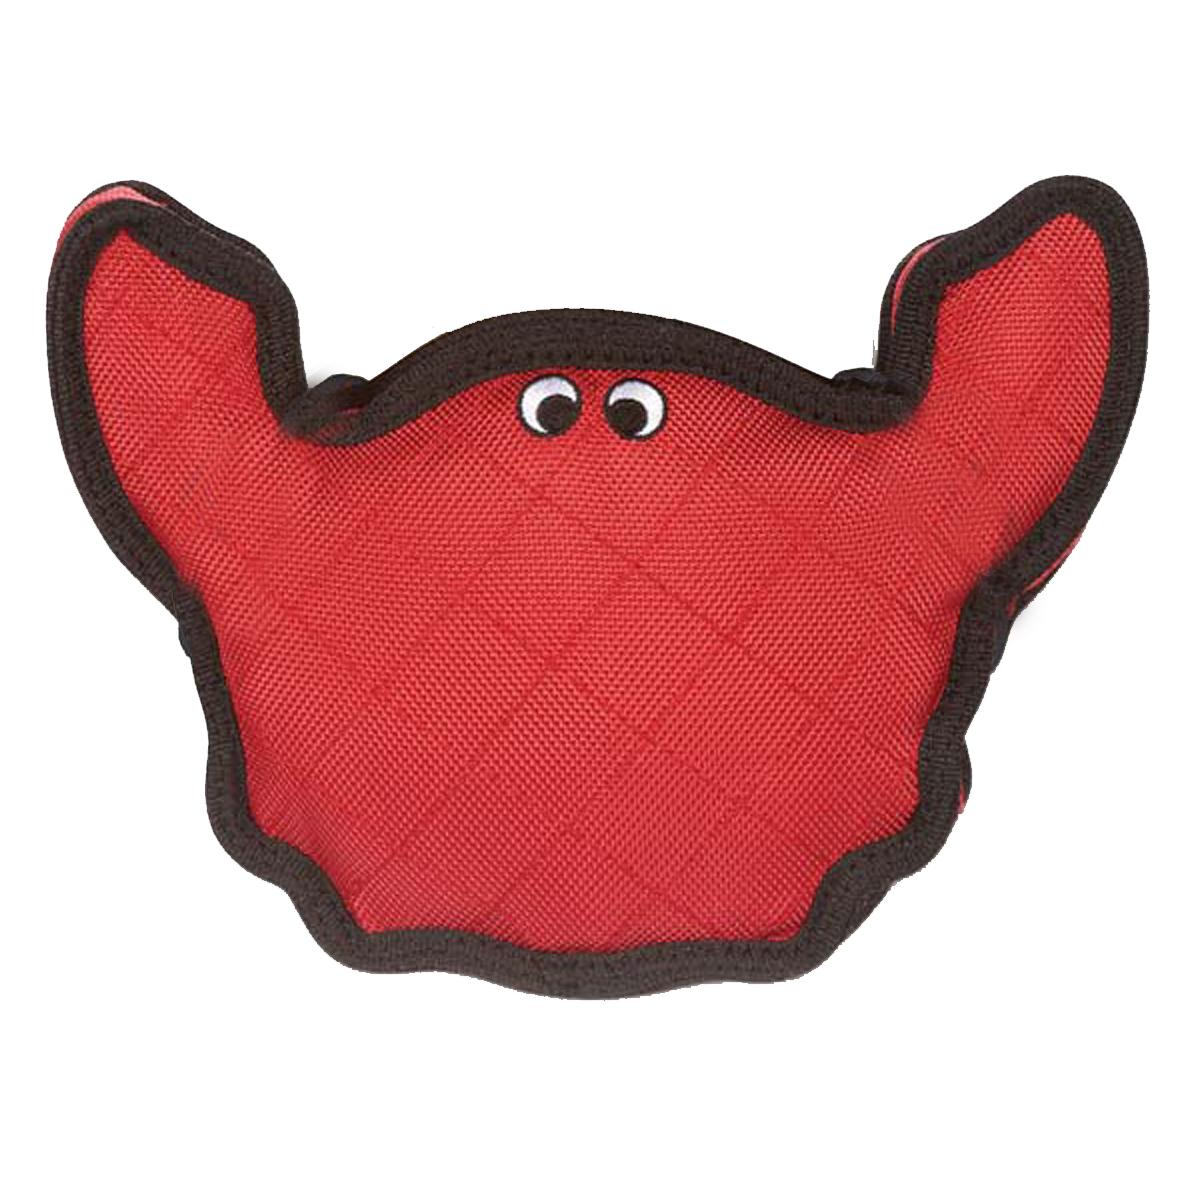 Be good seashore tough dog toy crab baxterboo for Super tuff dog toys